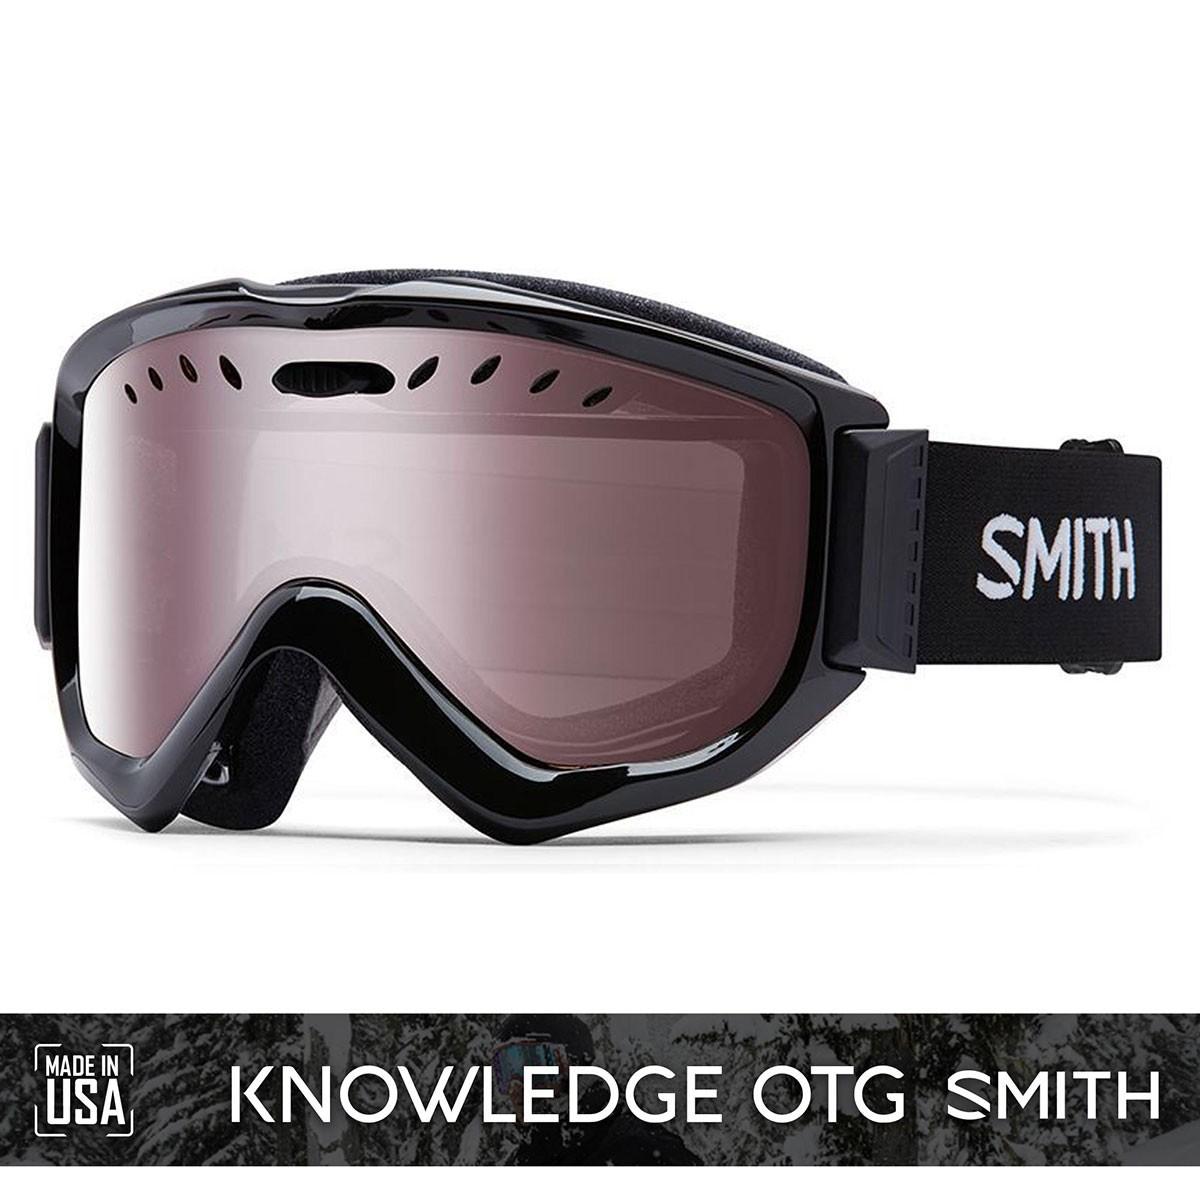 SMITH KNOWLEDGE Over The Glass   S2 IGNITOR Mirror - Изображение - AQUAMATRIX